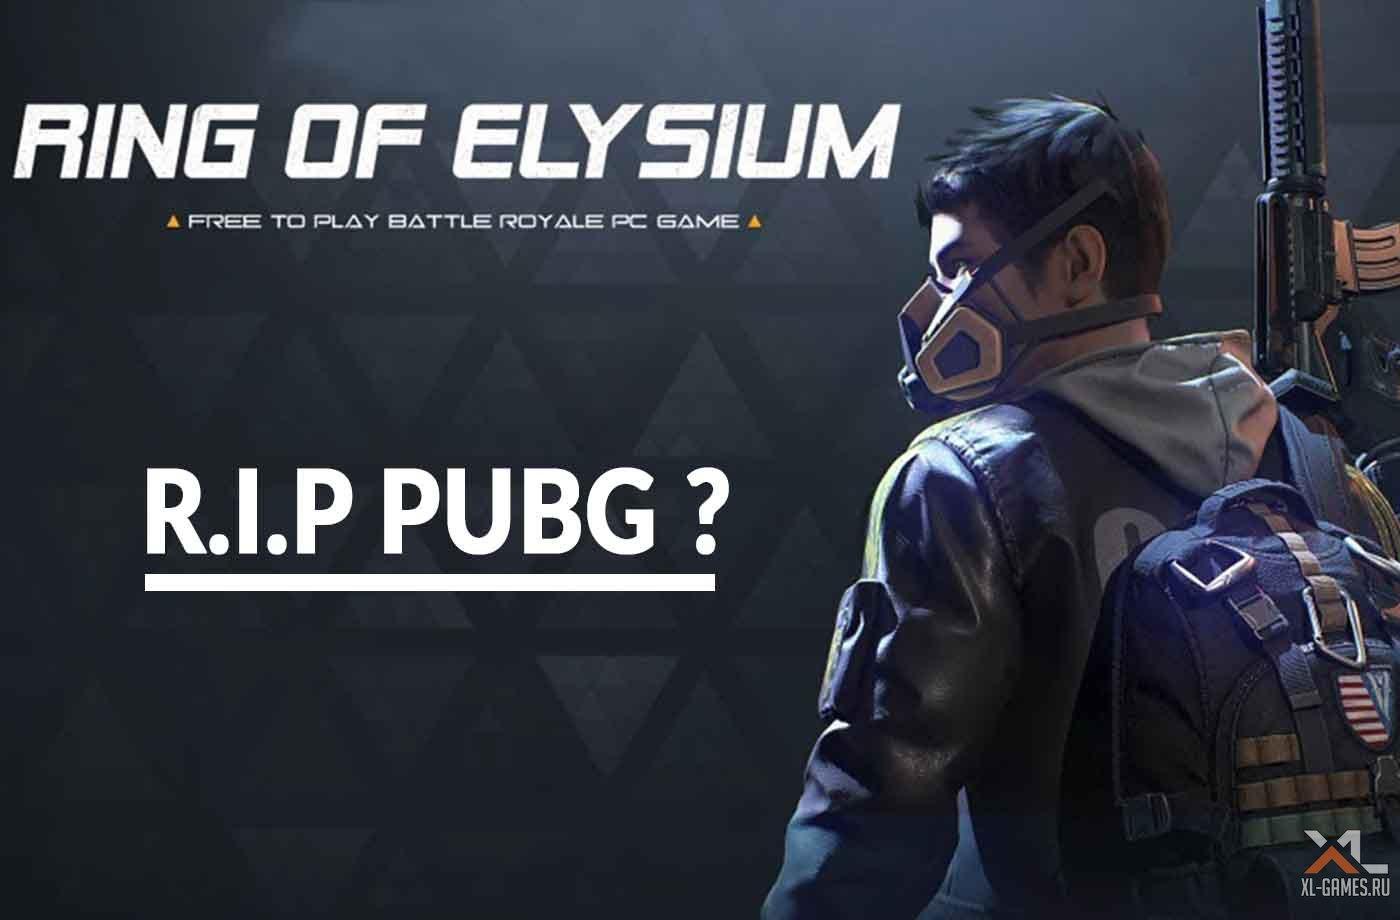 new-free-pc-game-ring-of-elysium.jpg